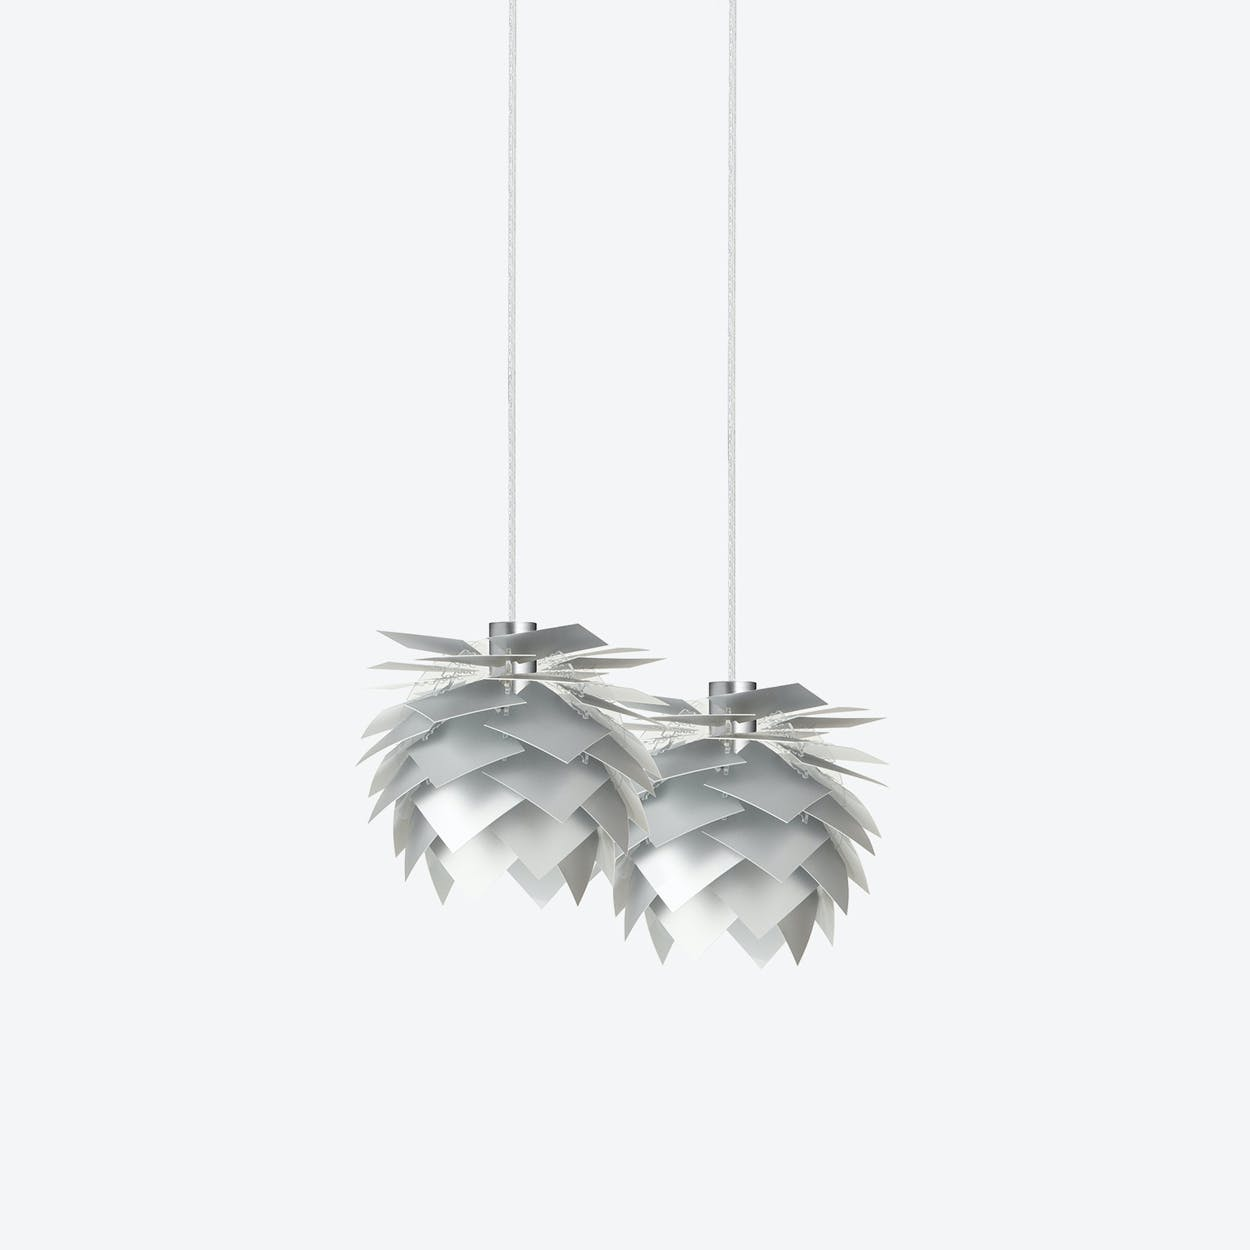 XS PineApple Set of Pendants in Aluminium Look